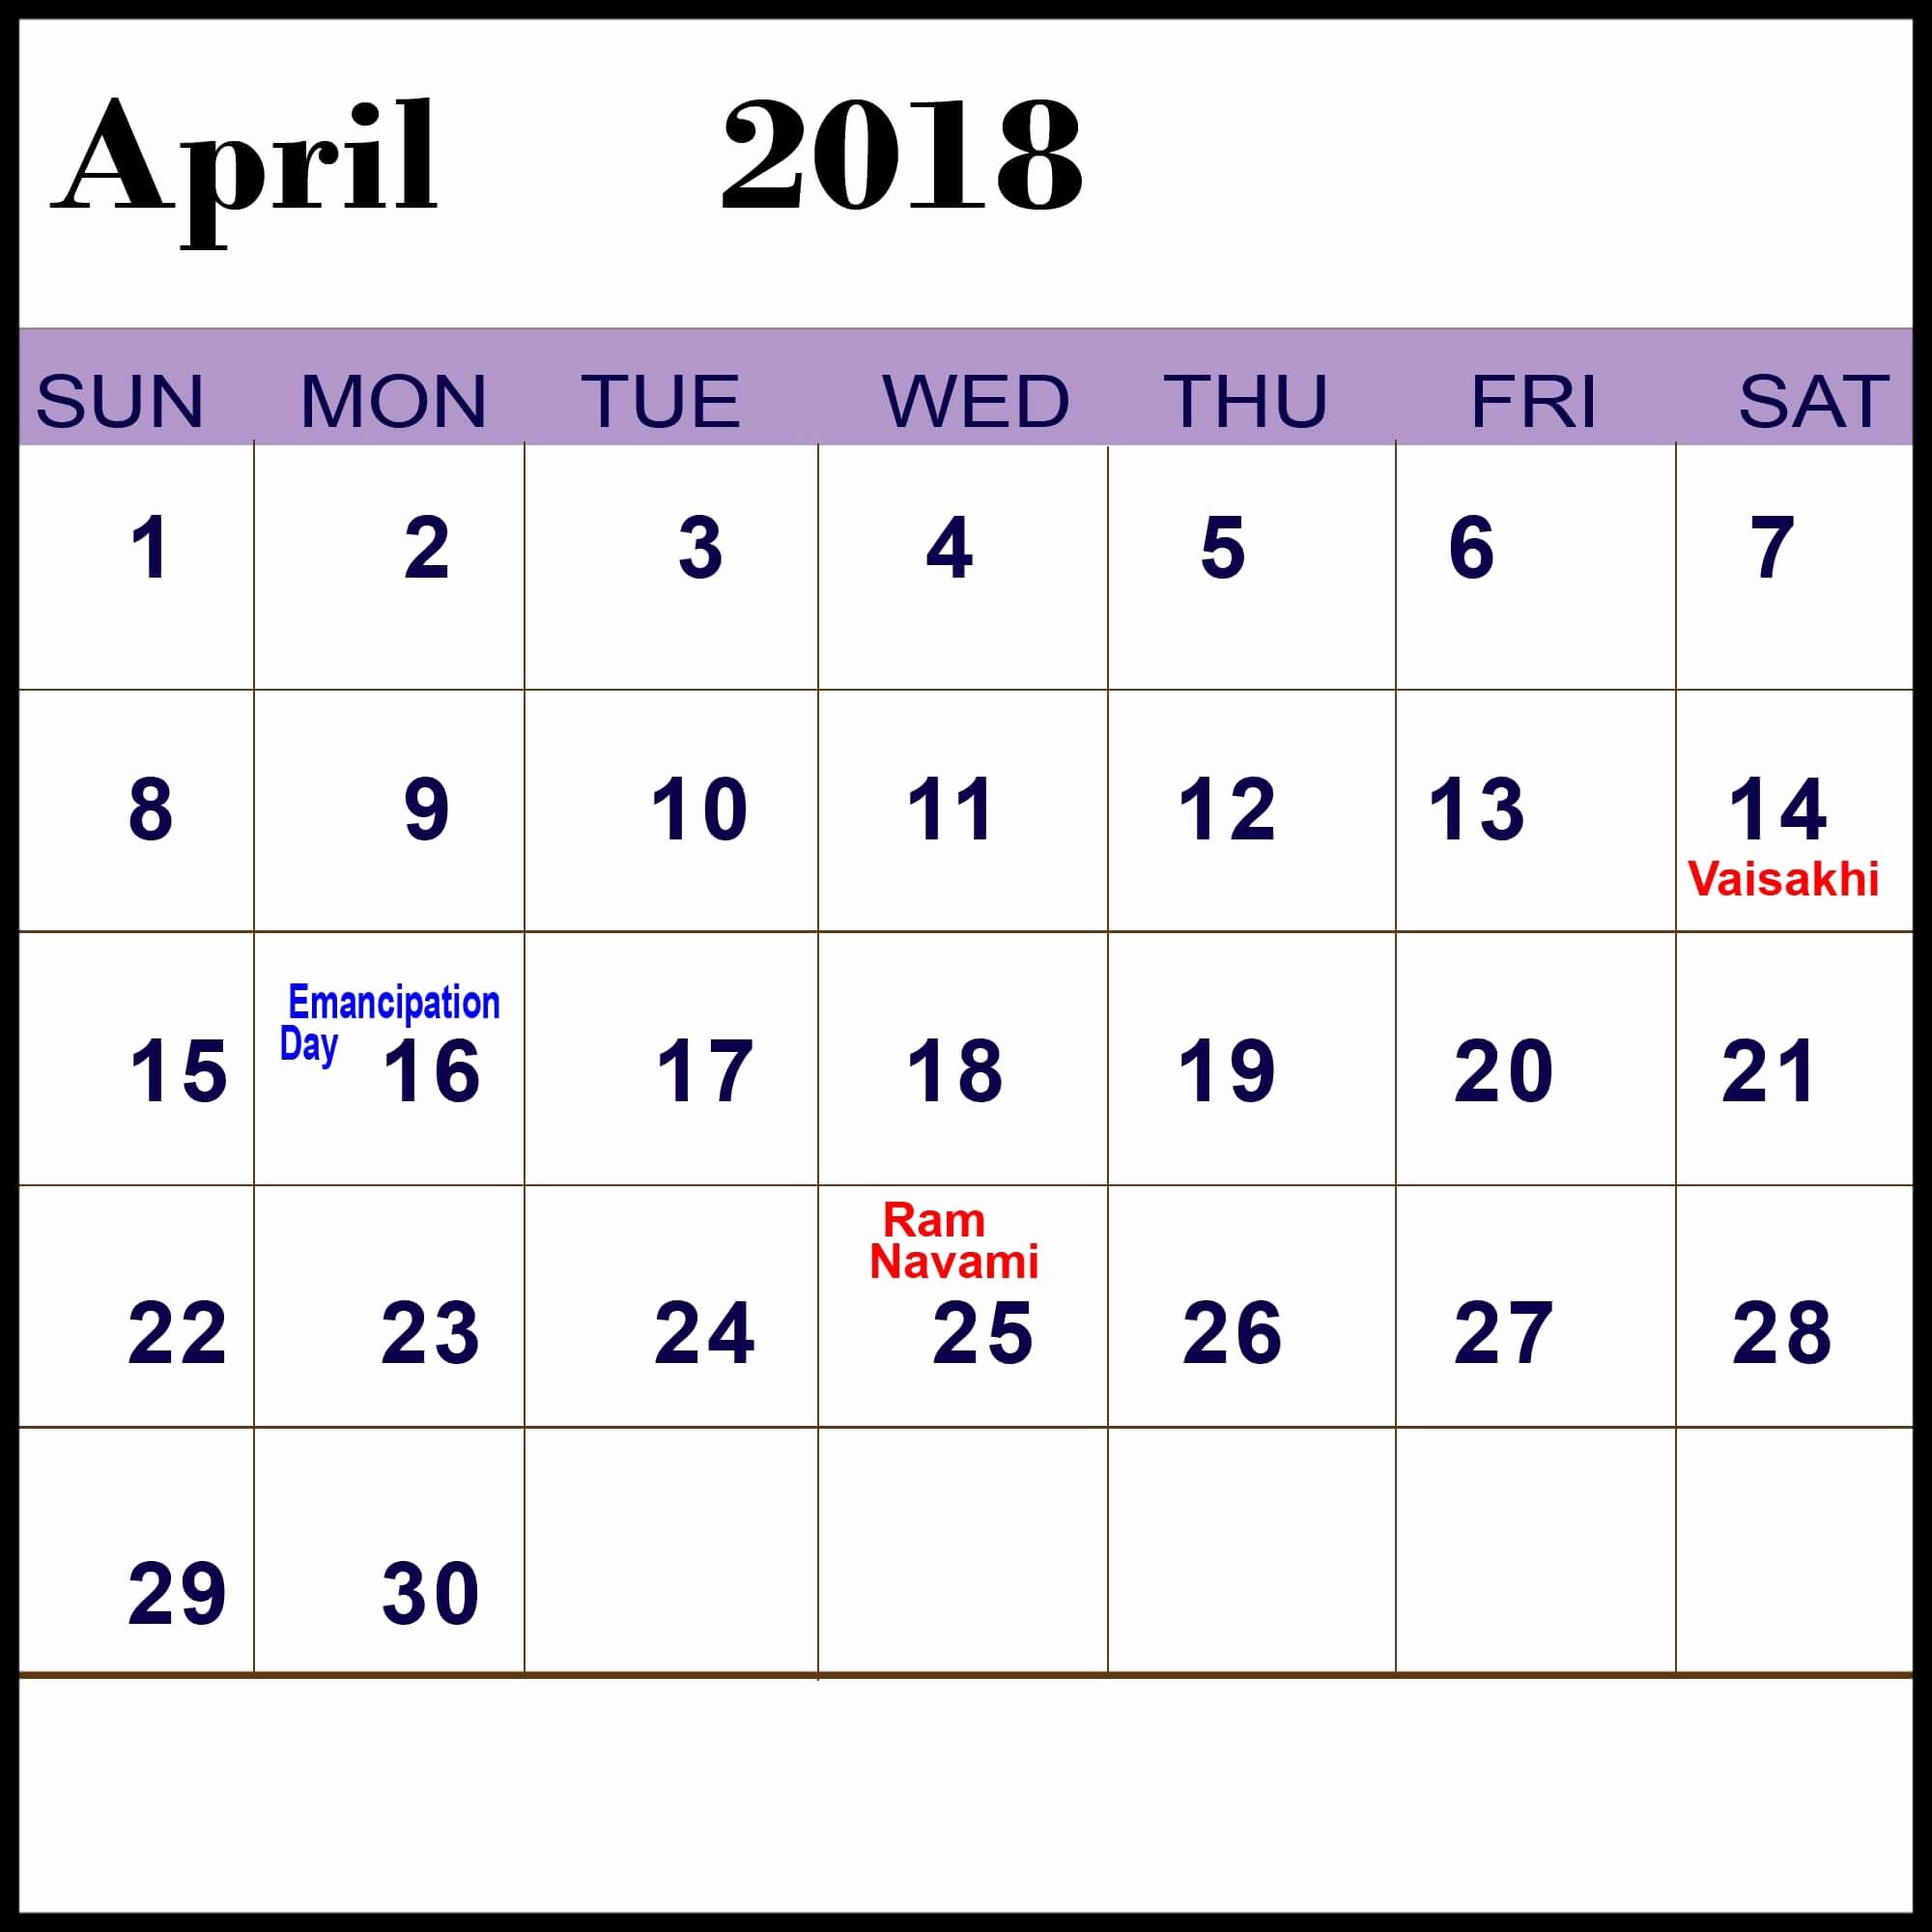 Calendar 2018 Printable with Holidays New April 2018 Calendar with Holidays In Usa Uk Canada India